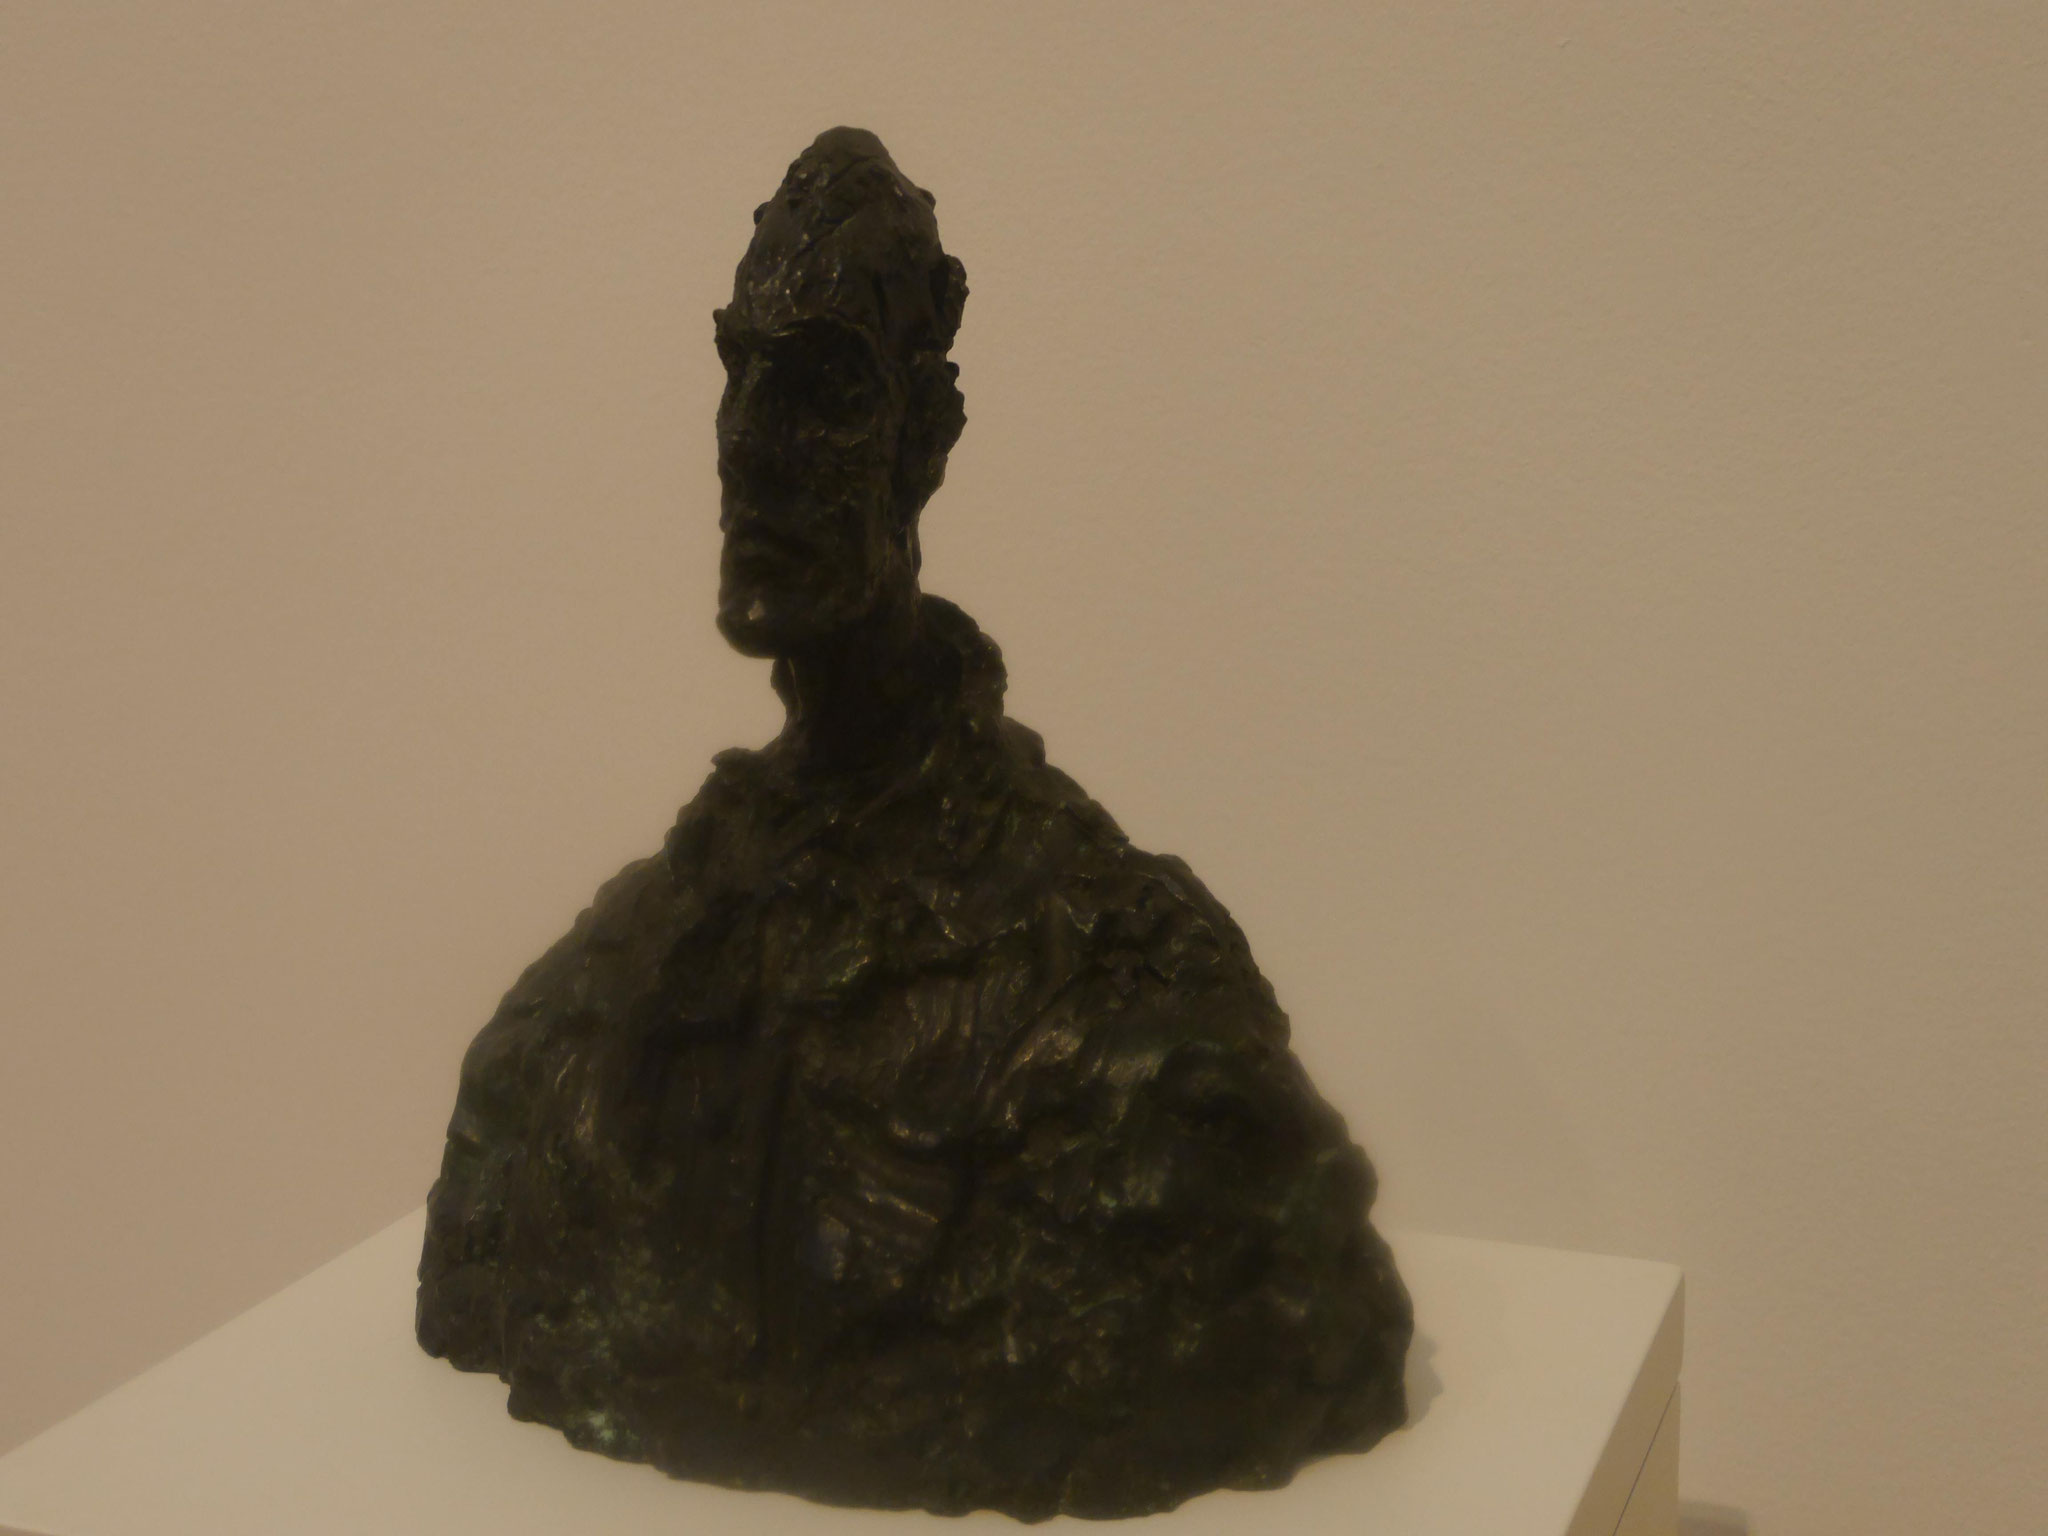 Alberto Giacometti, National Galery of Canada, Ottawa